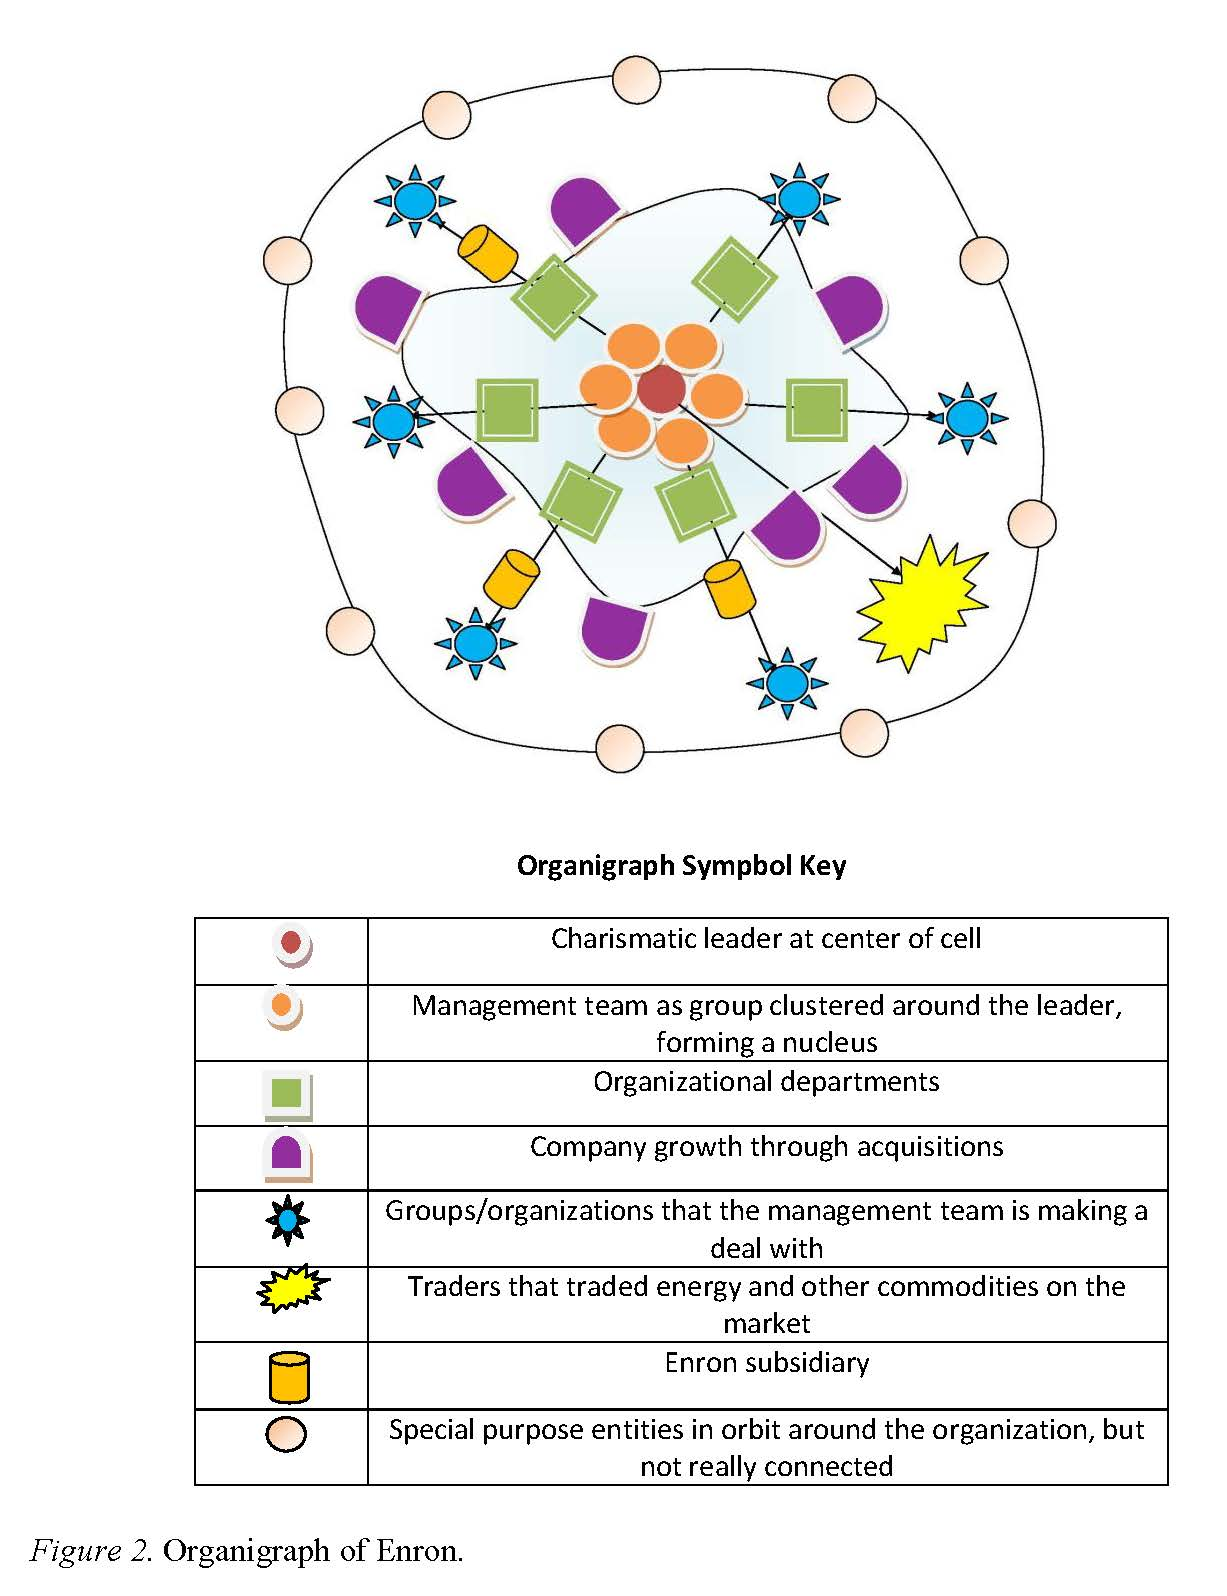 Organigraph as image